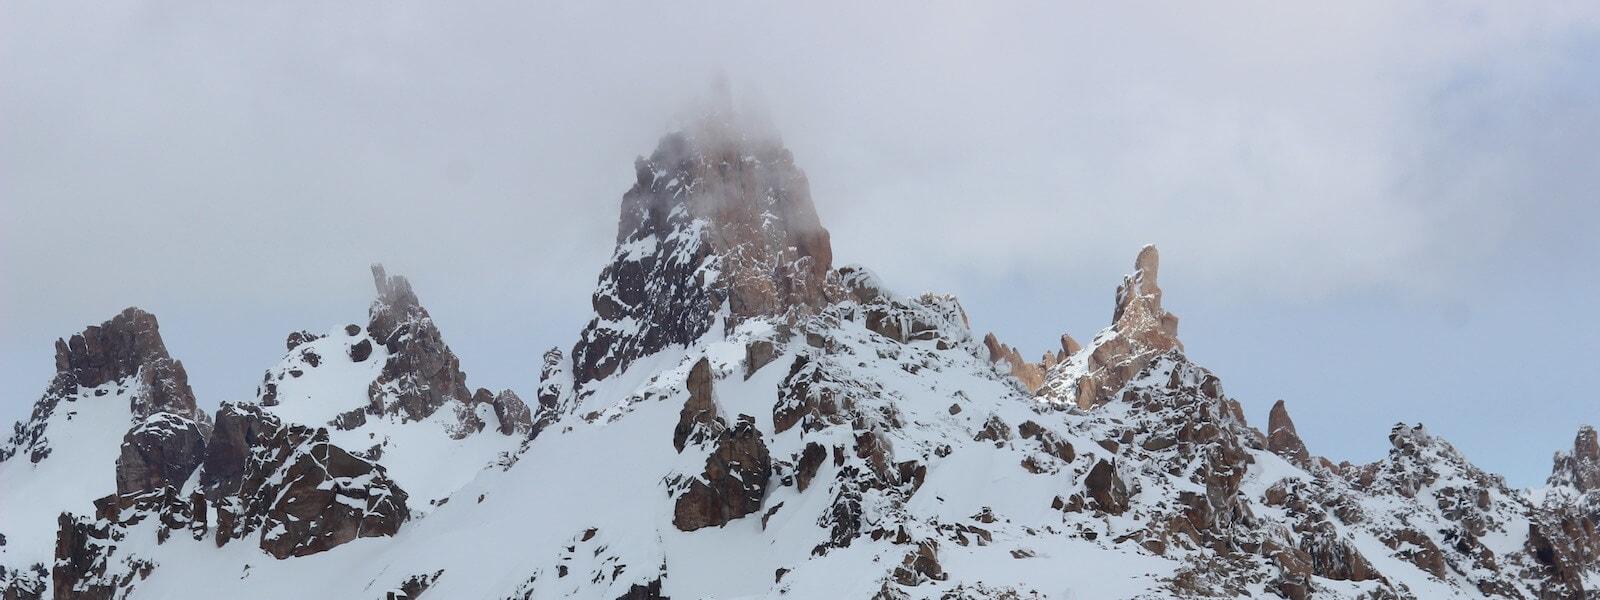 la hoya ski resort and the patagonia landscape